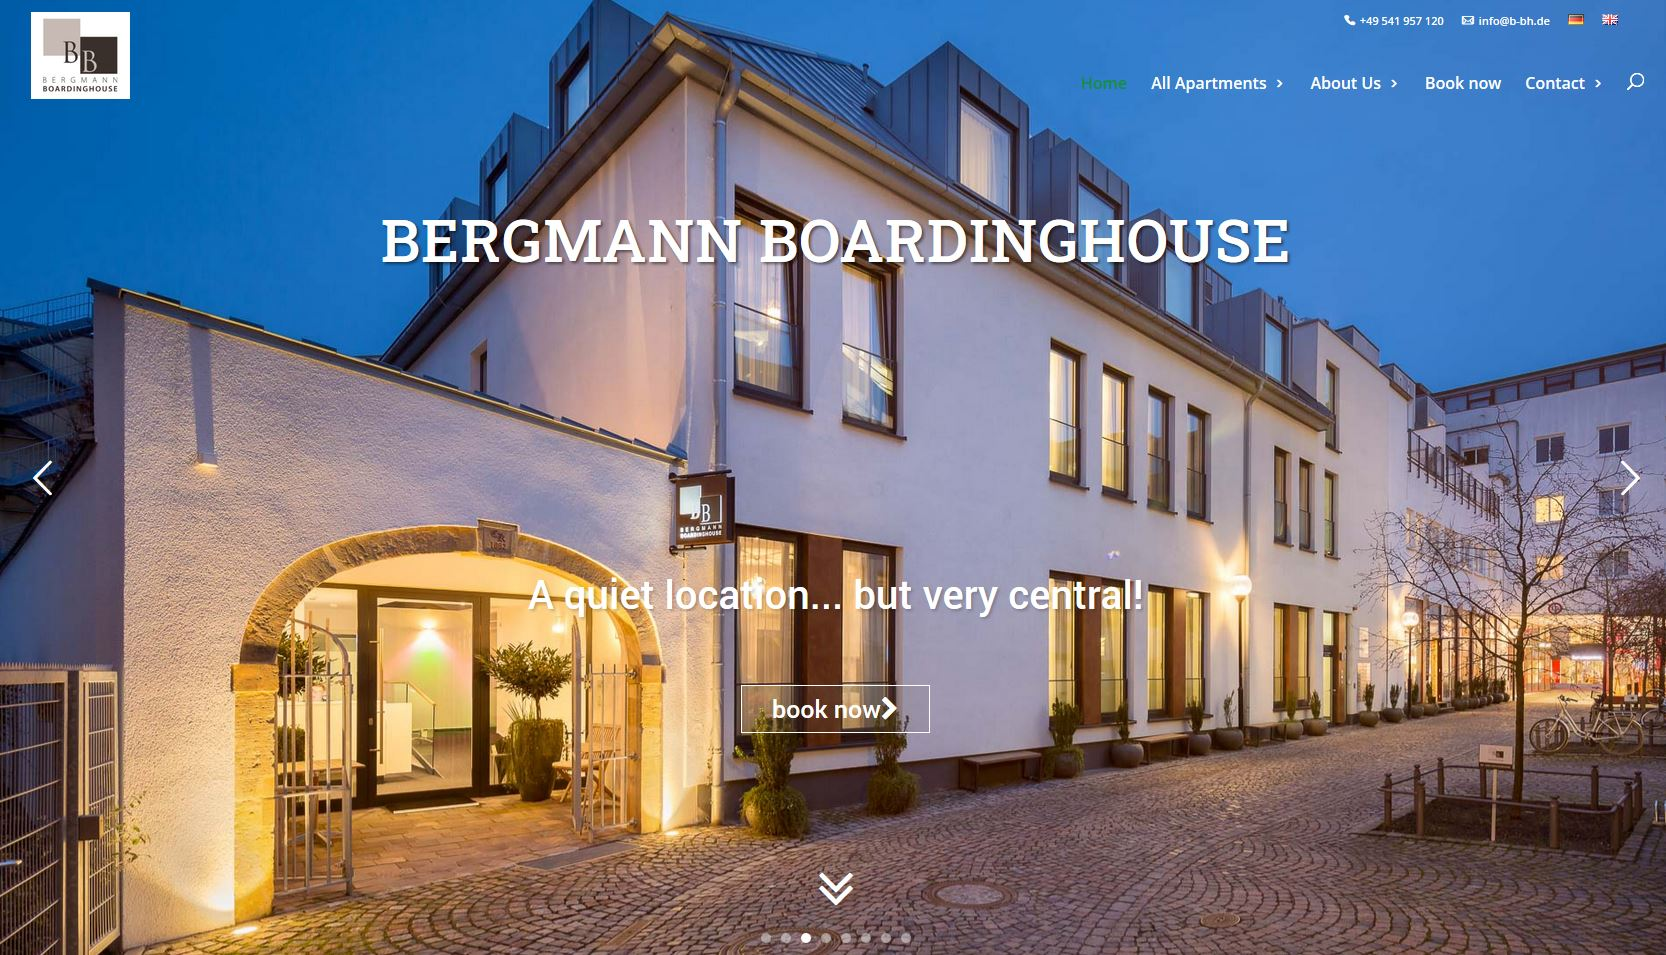 Bergamann Boarding House - Book Now